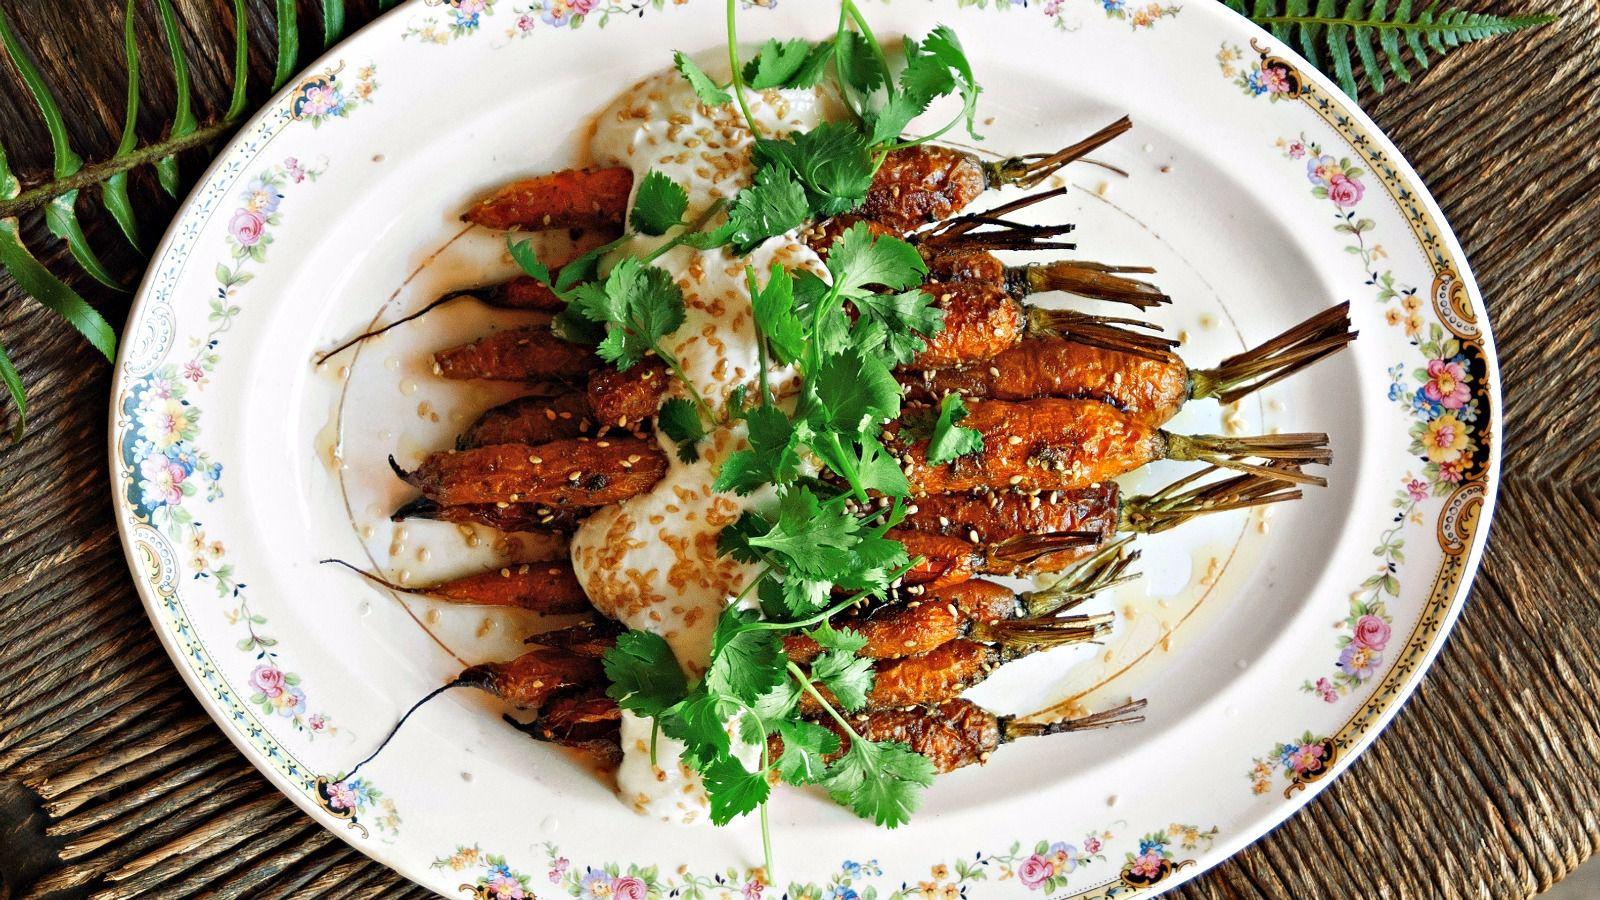 Roasted Carrots With Zau0027atar Topped With Greek Yogurt, Cilantro And Sesame  Seeds Was